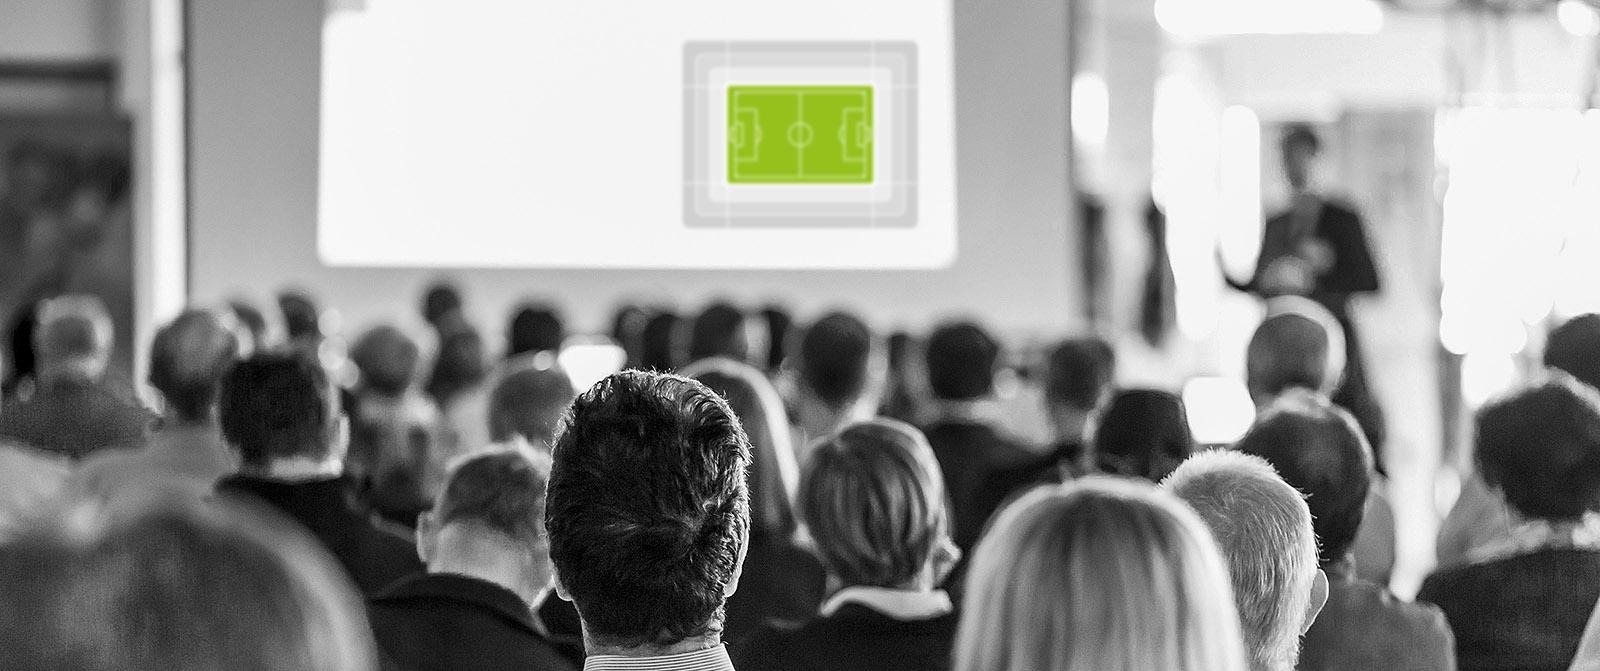 keynotes - Fußball, Management, Führung